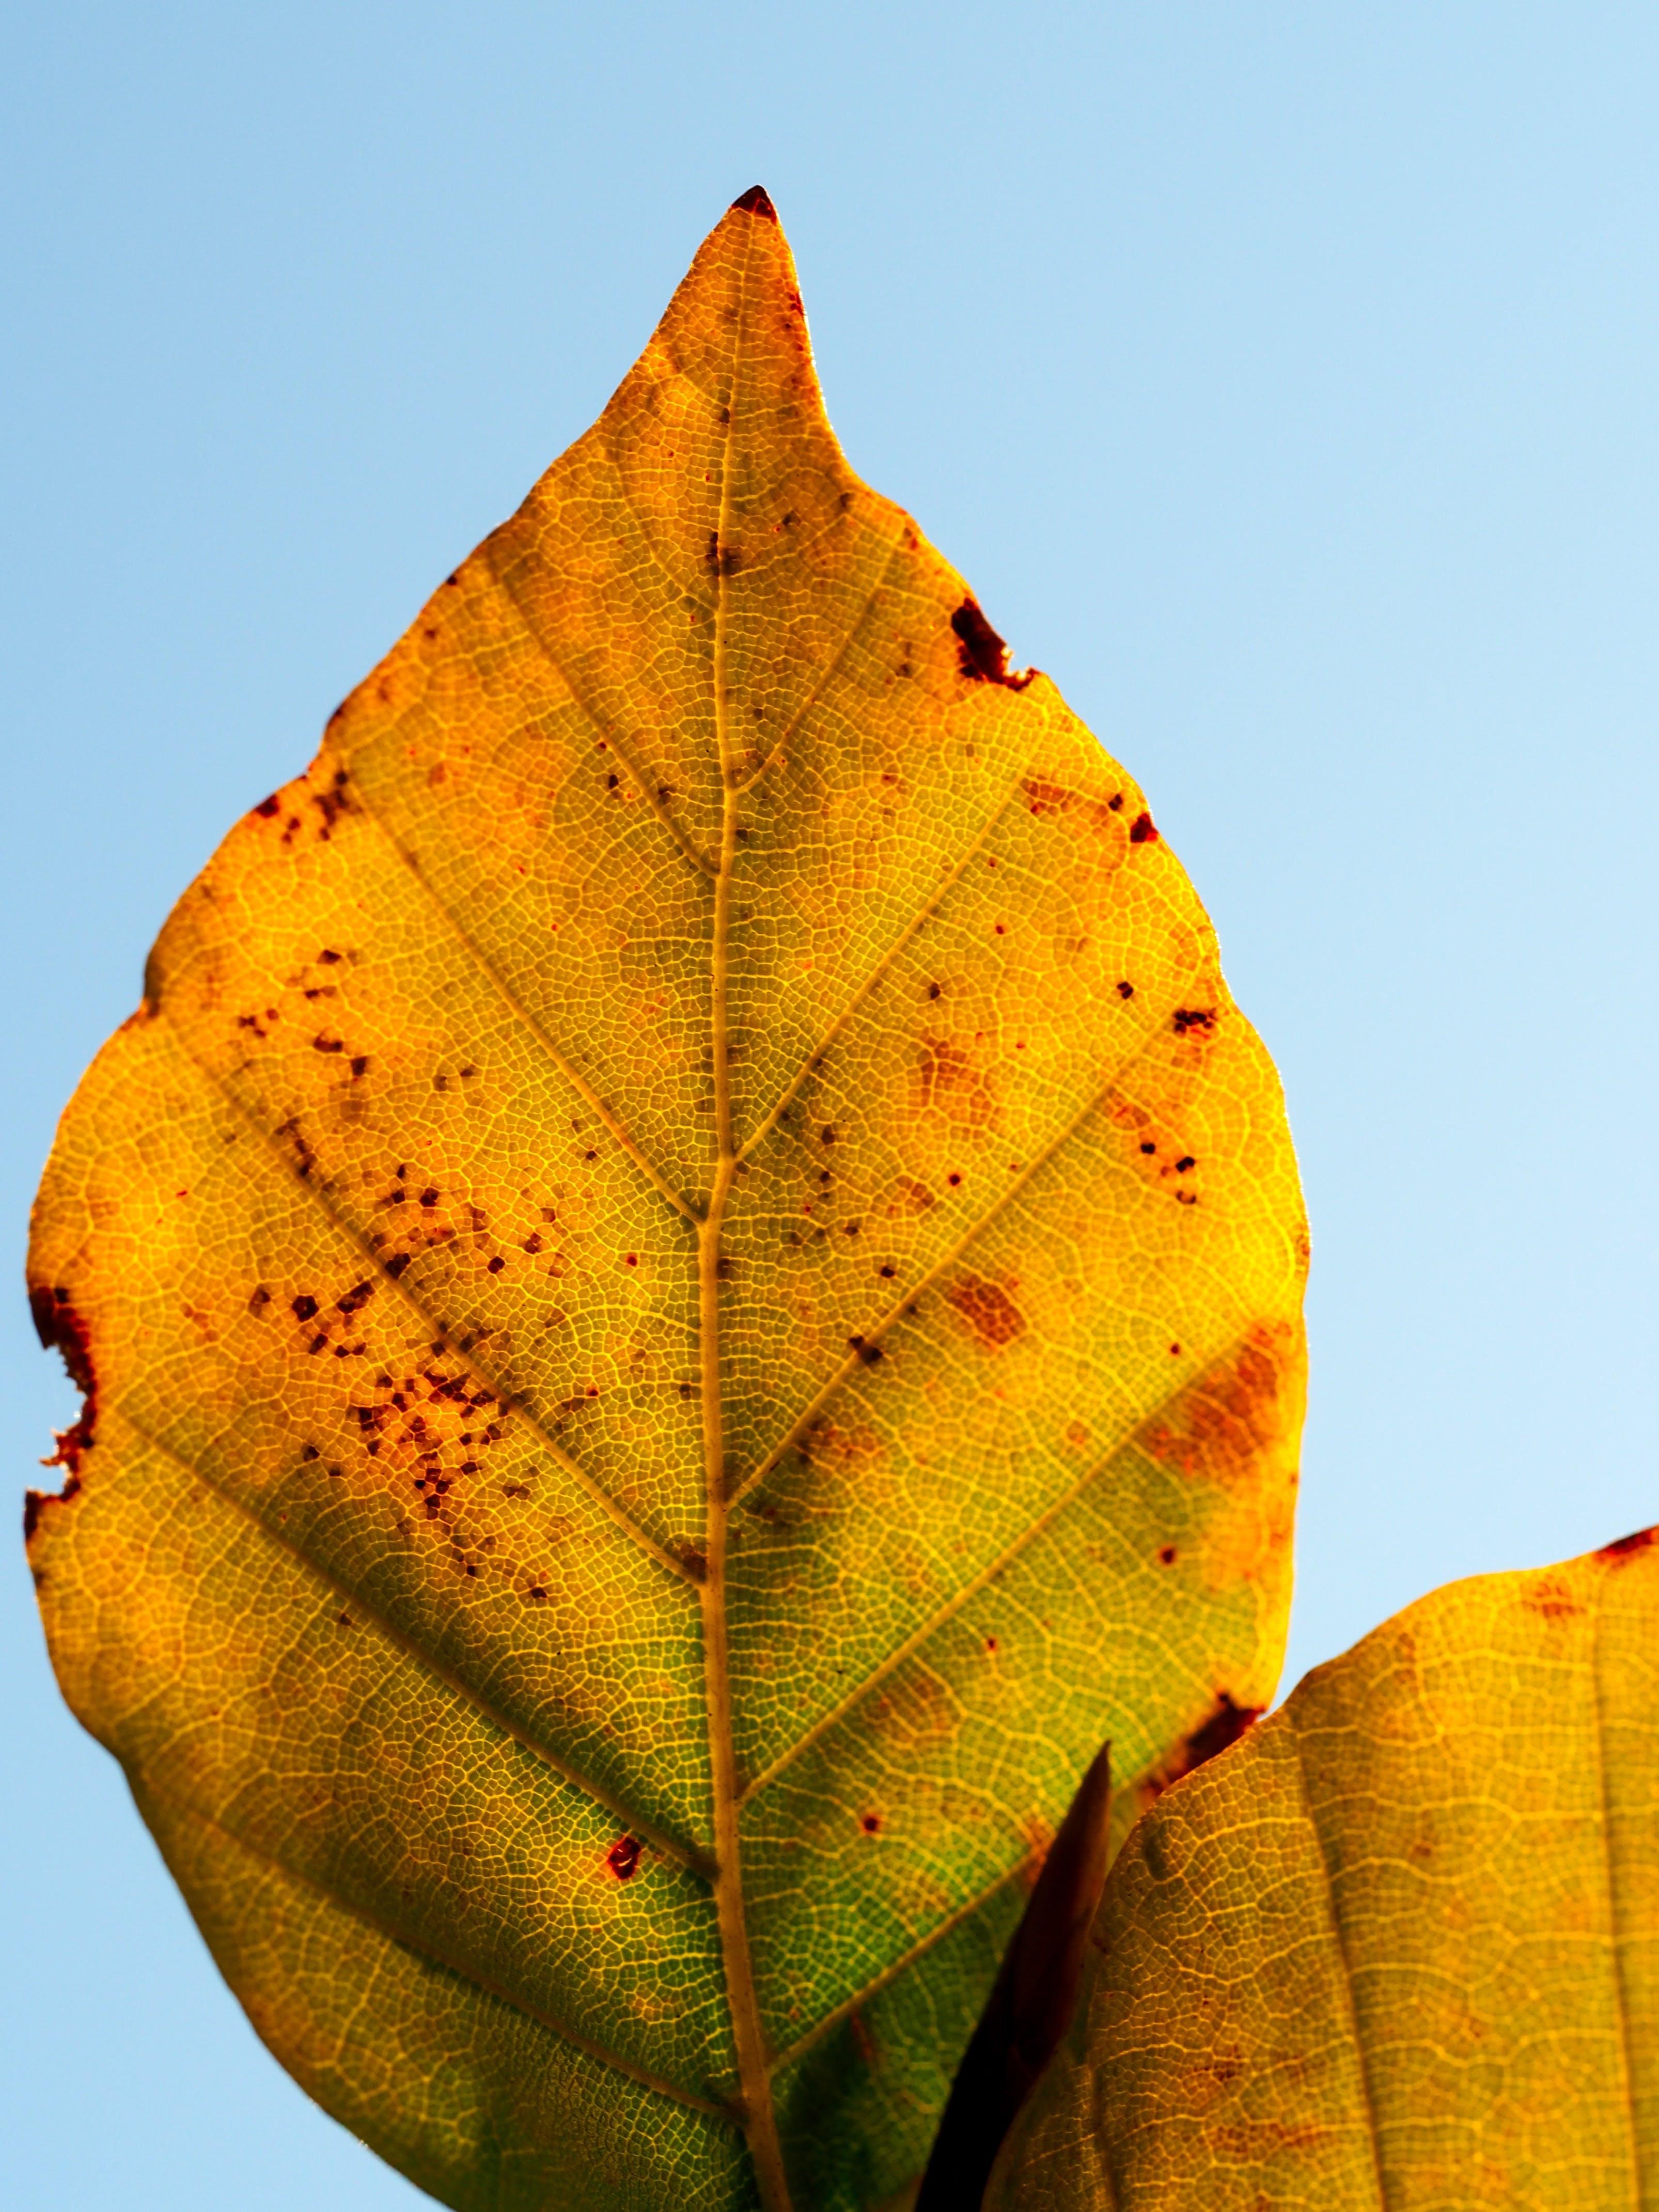 Free stock photo of nature, yellow, leaf, autumn